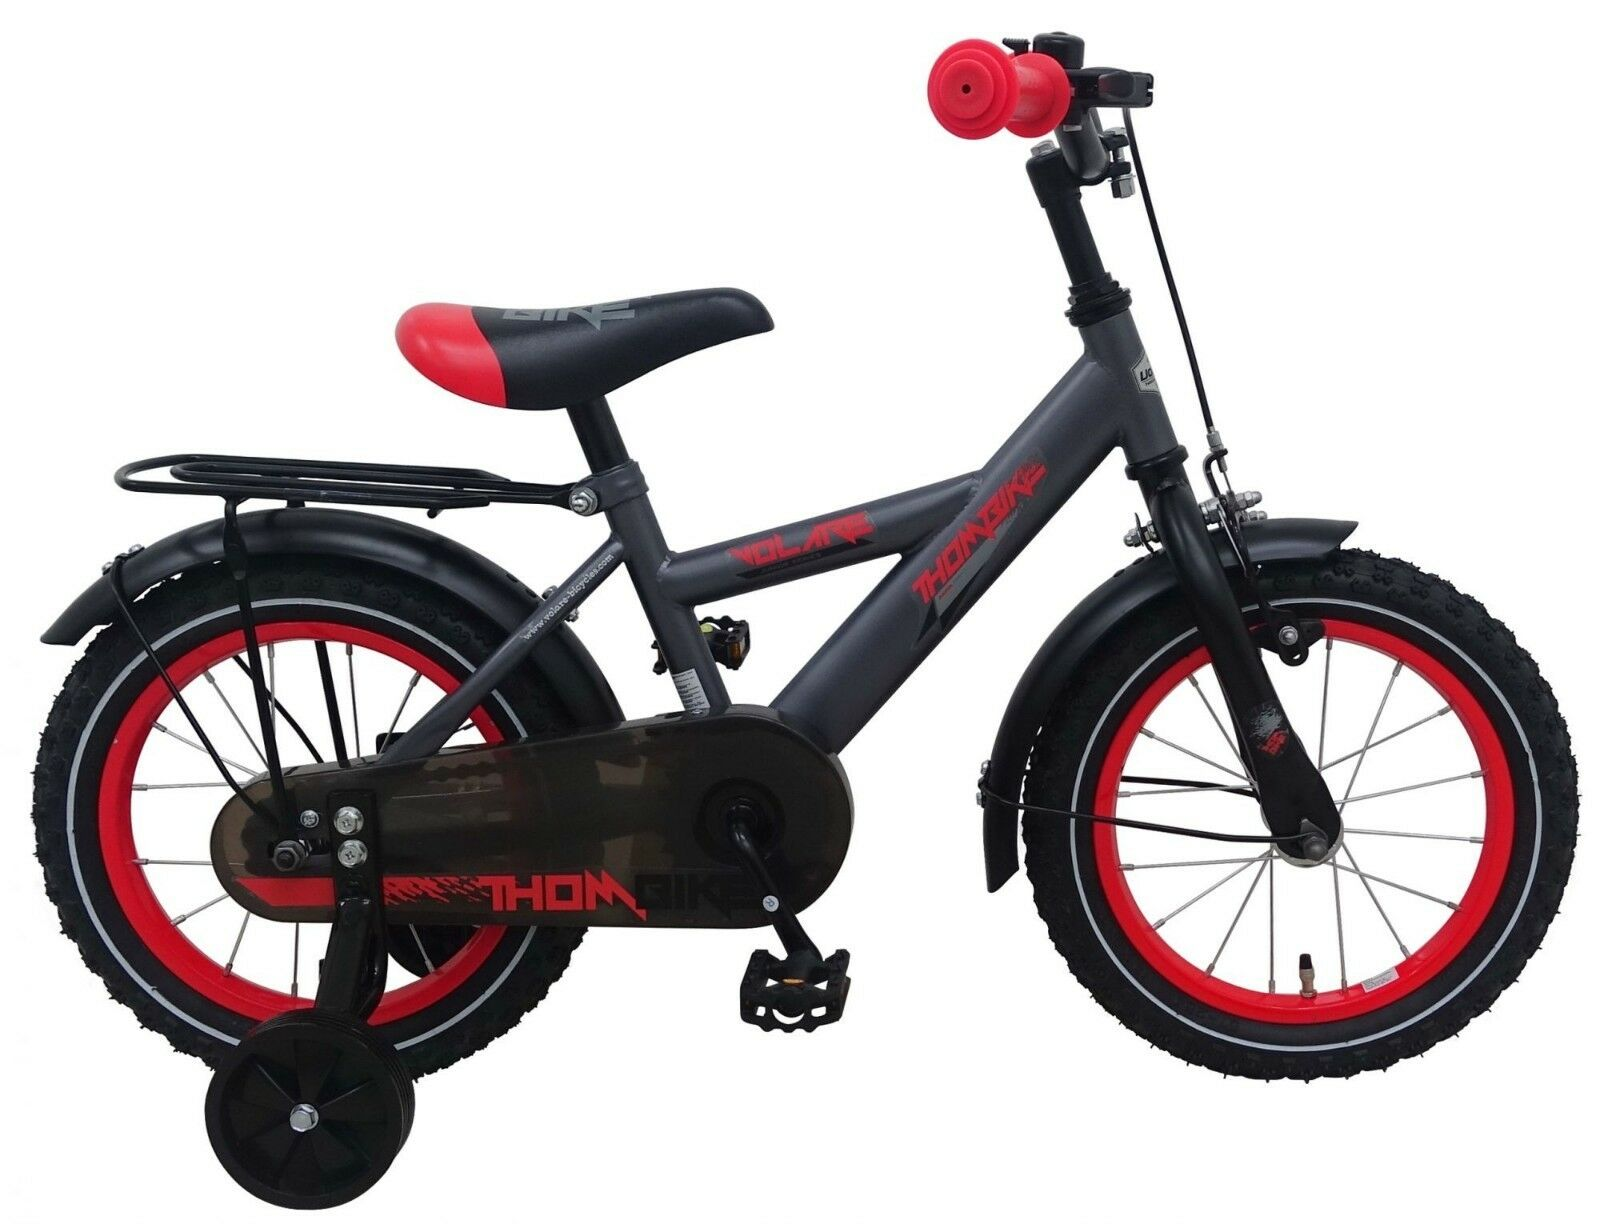 14 Zoll Fahrrad  Kinderfahrrad Jungen Kinder Stützräder Schwarz Rot